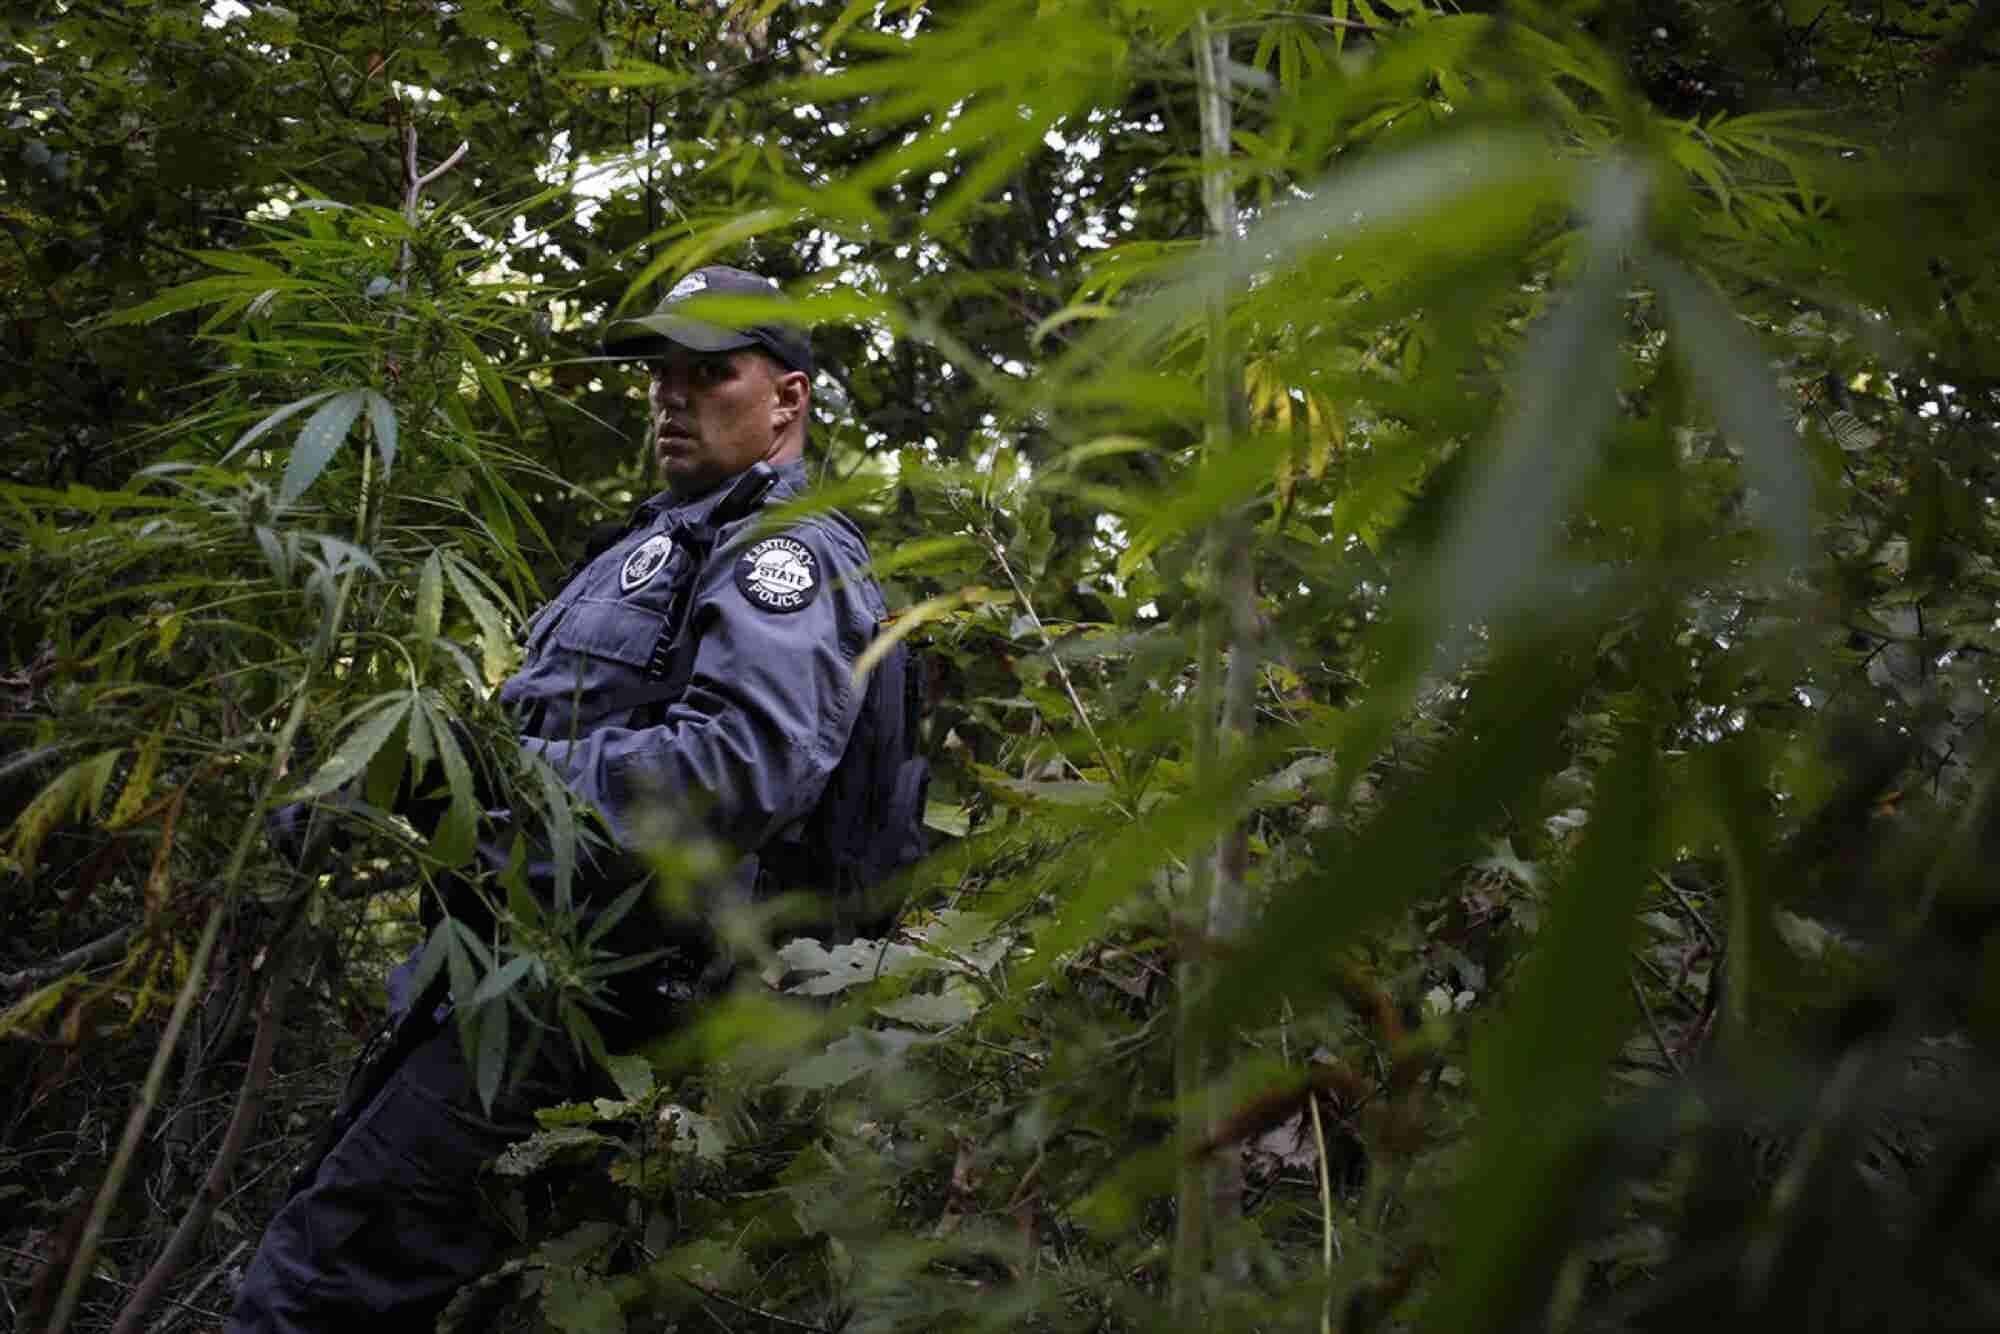 Survey Finds Most Police Officers Support Medical Marijuana